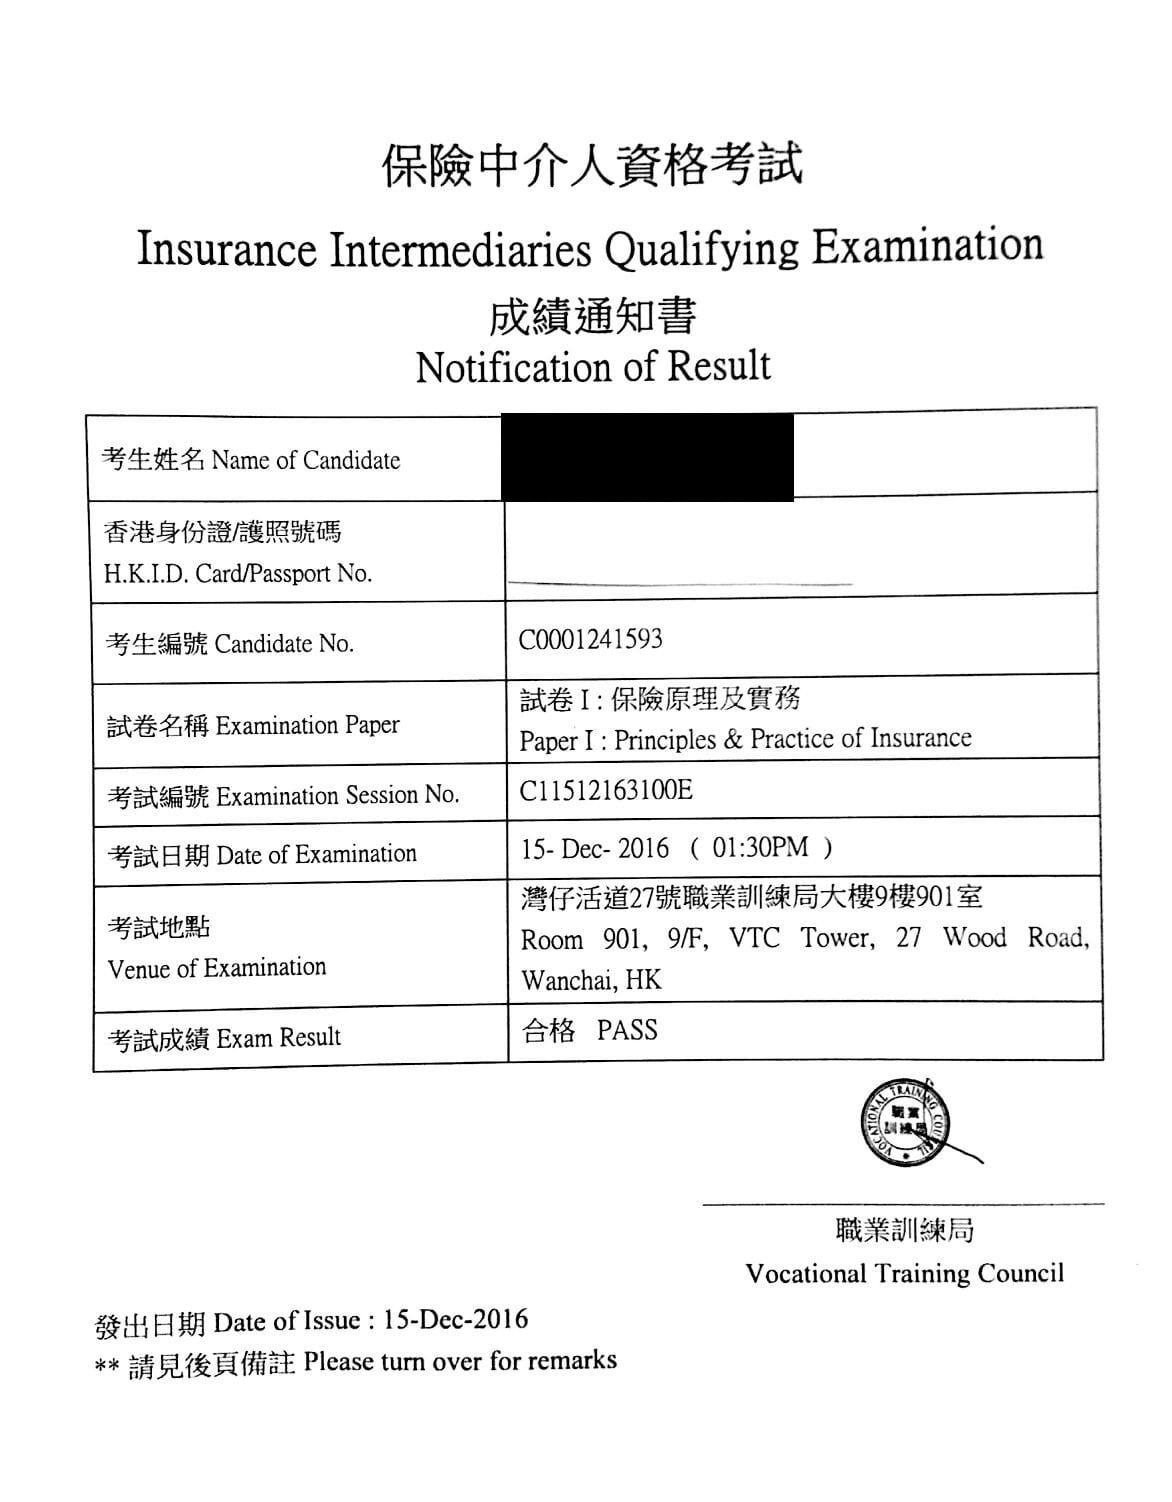 WHL 15/12/2016 IIQE Paper 1 保險中介人資格考試卷一 Pass